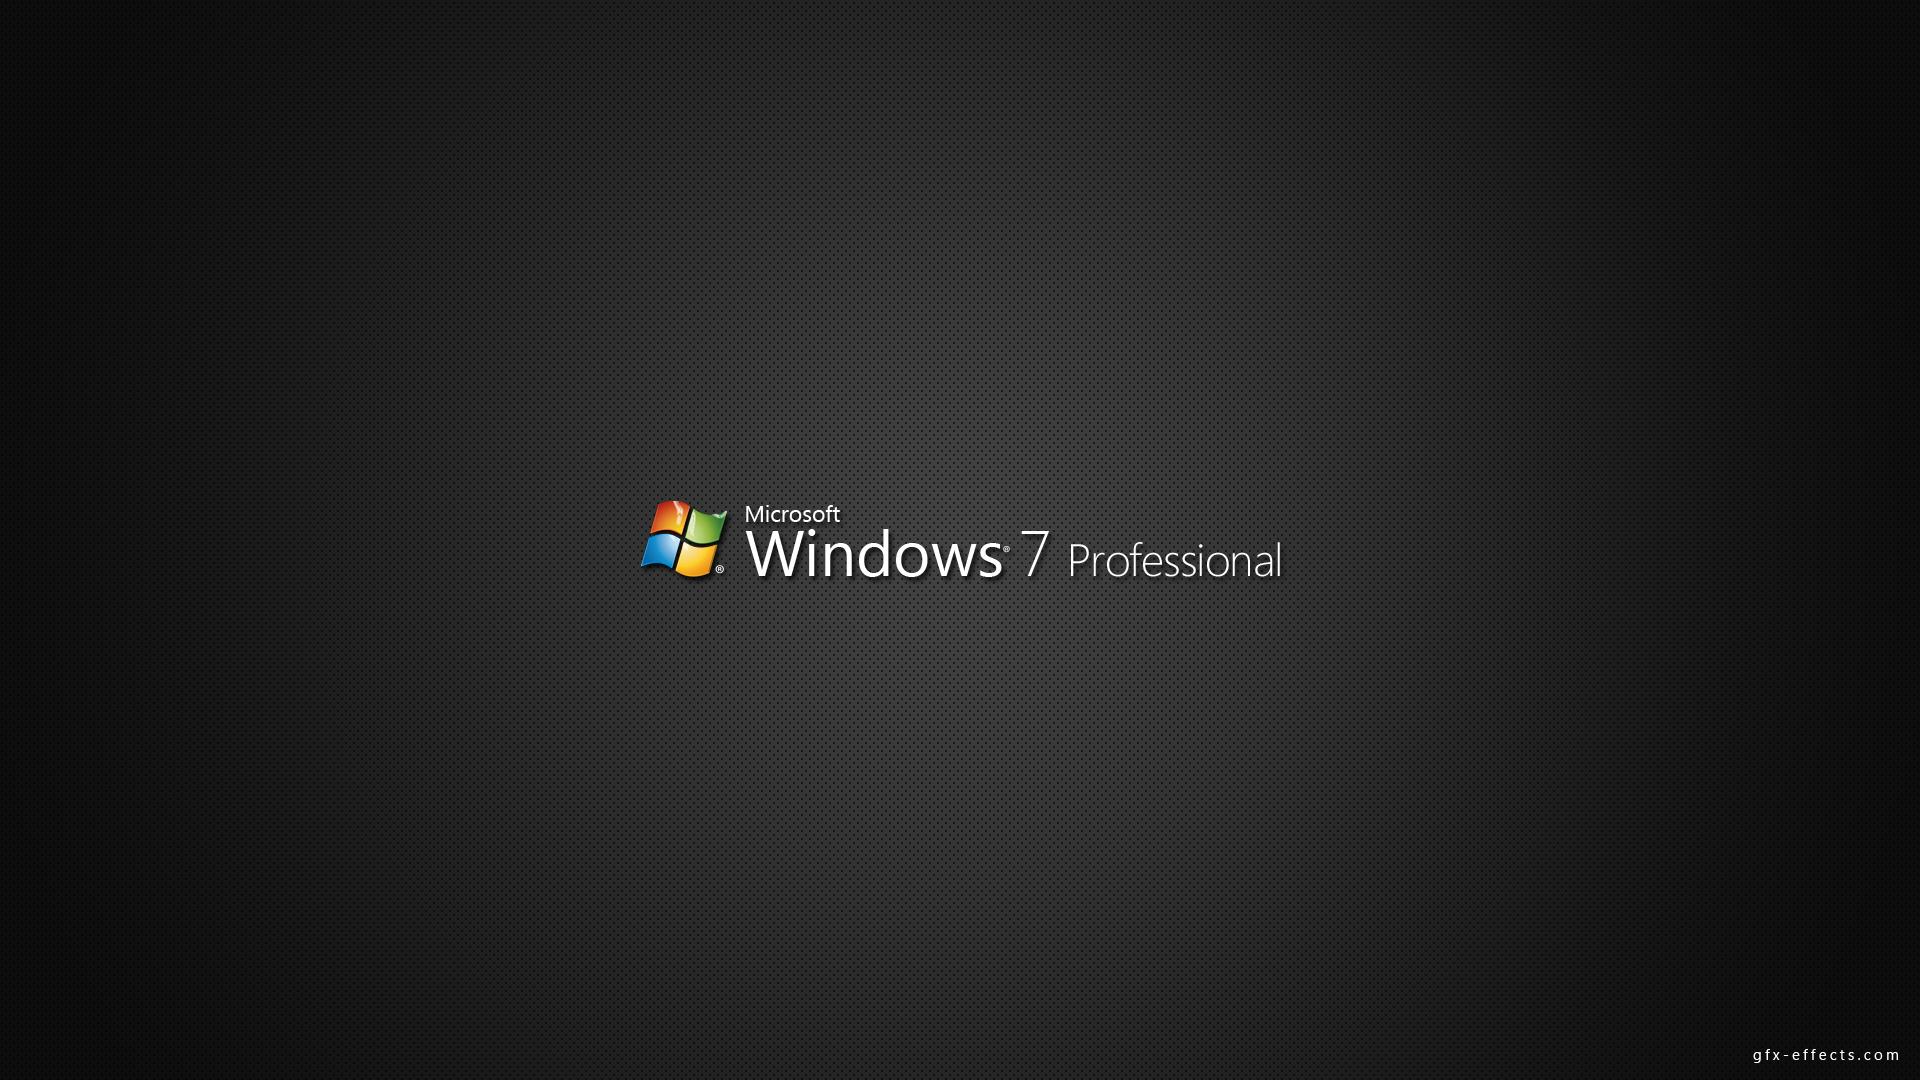 Windows 7 professional wallpaper wallpapersafari for Wallpaper home pro